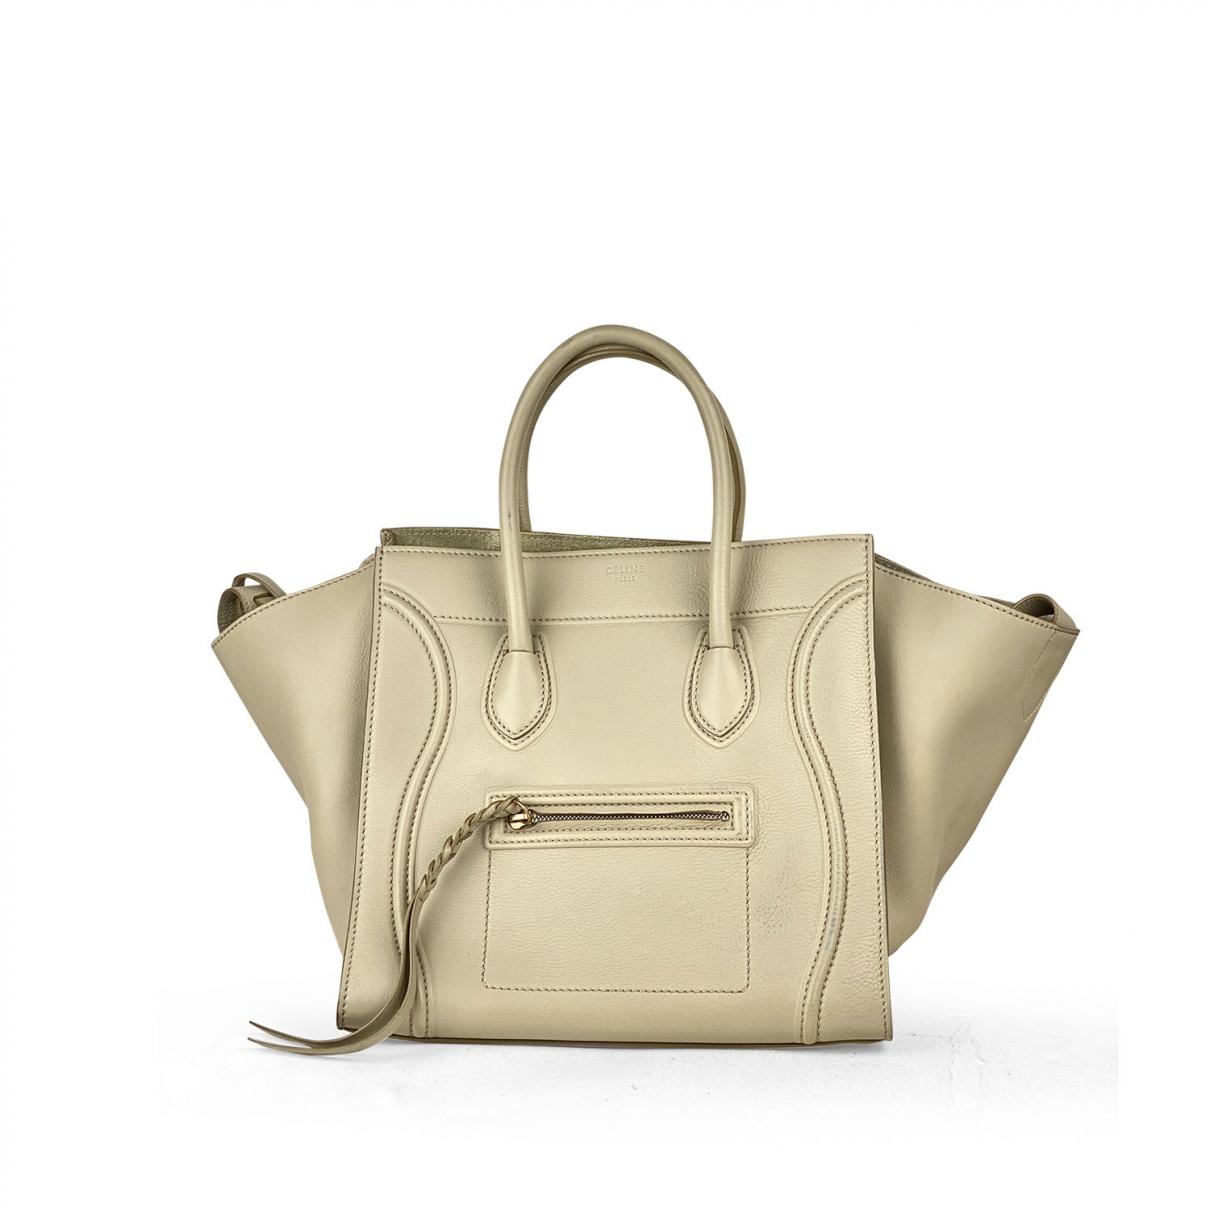 Celine Luggage Phantom Beige Leather handbag for Women \N